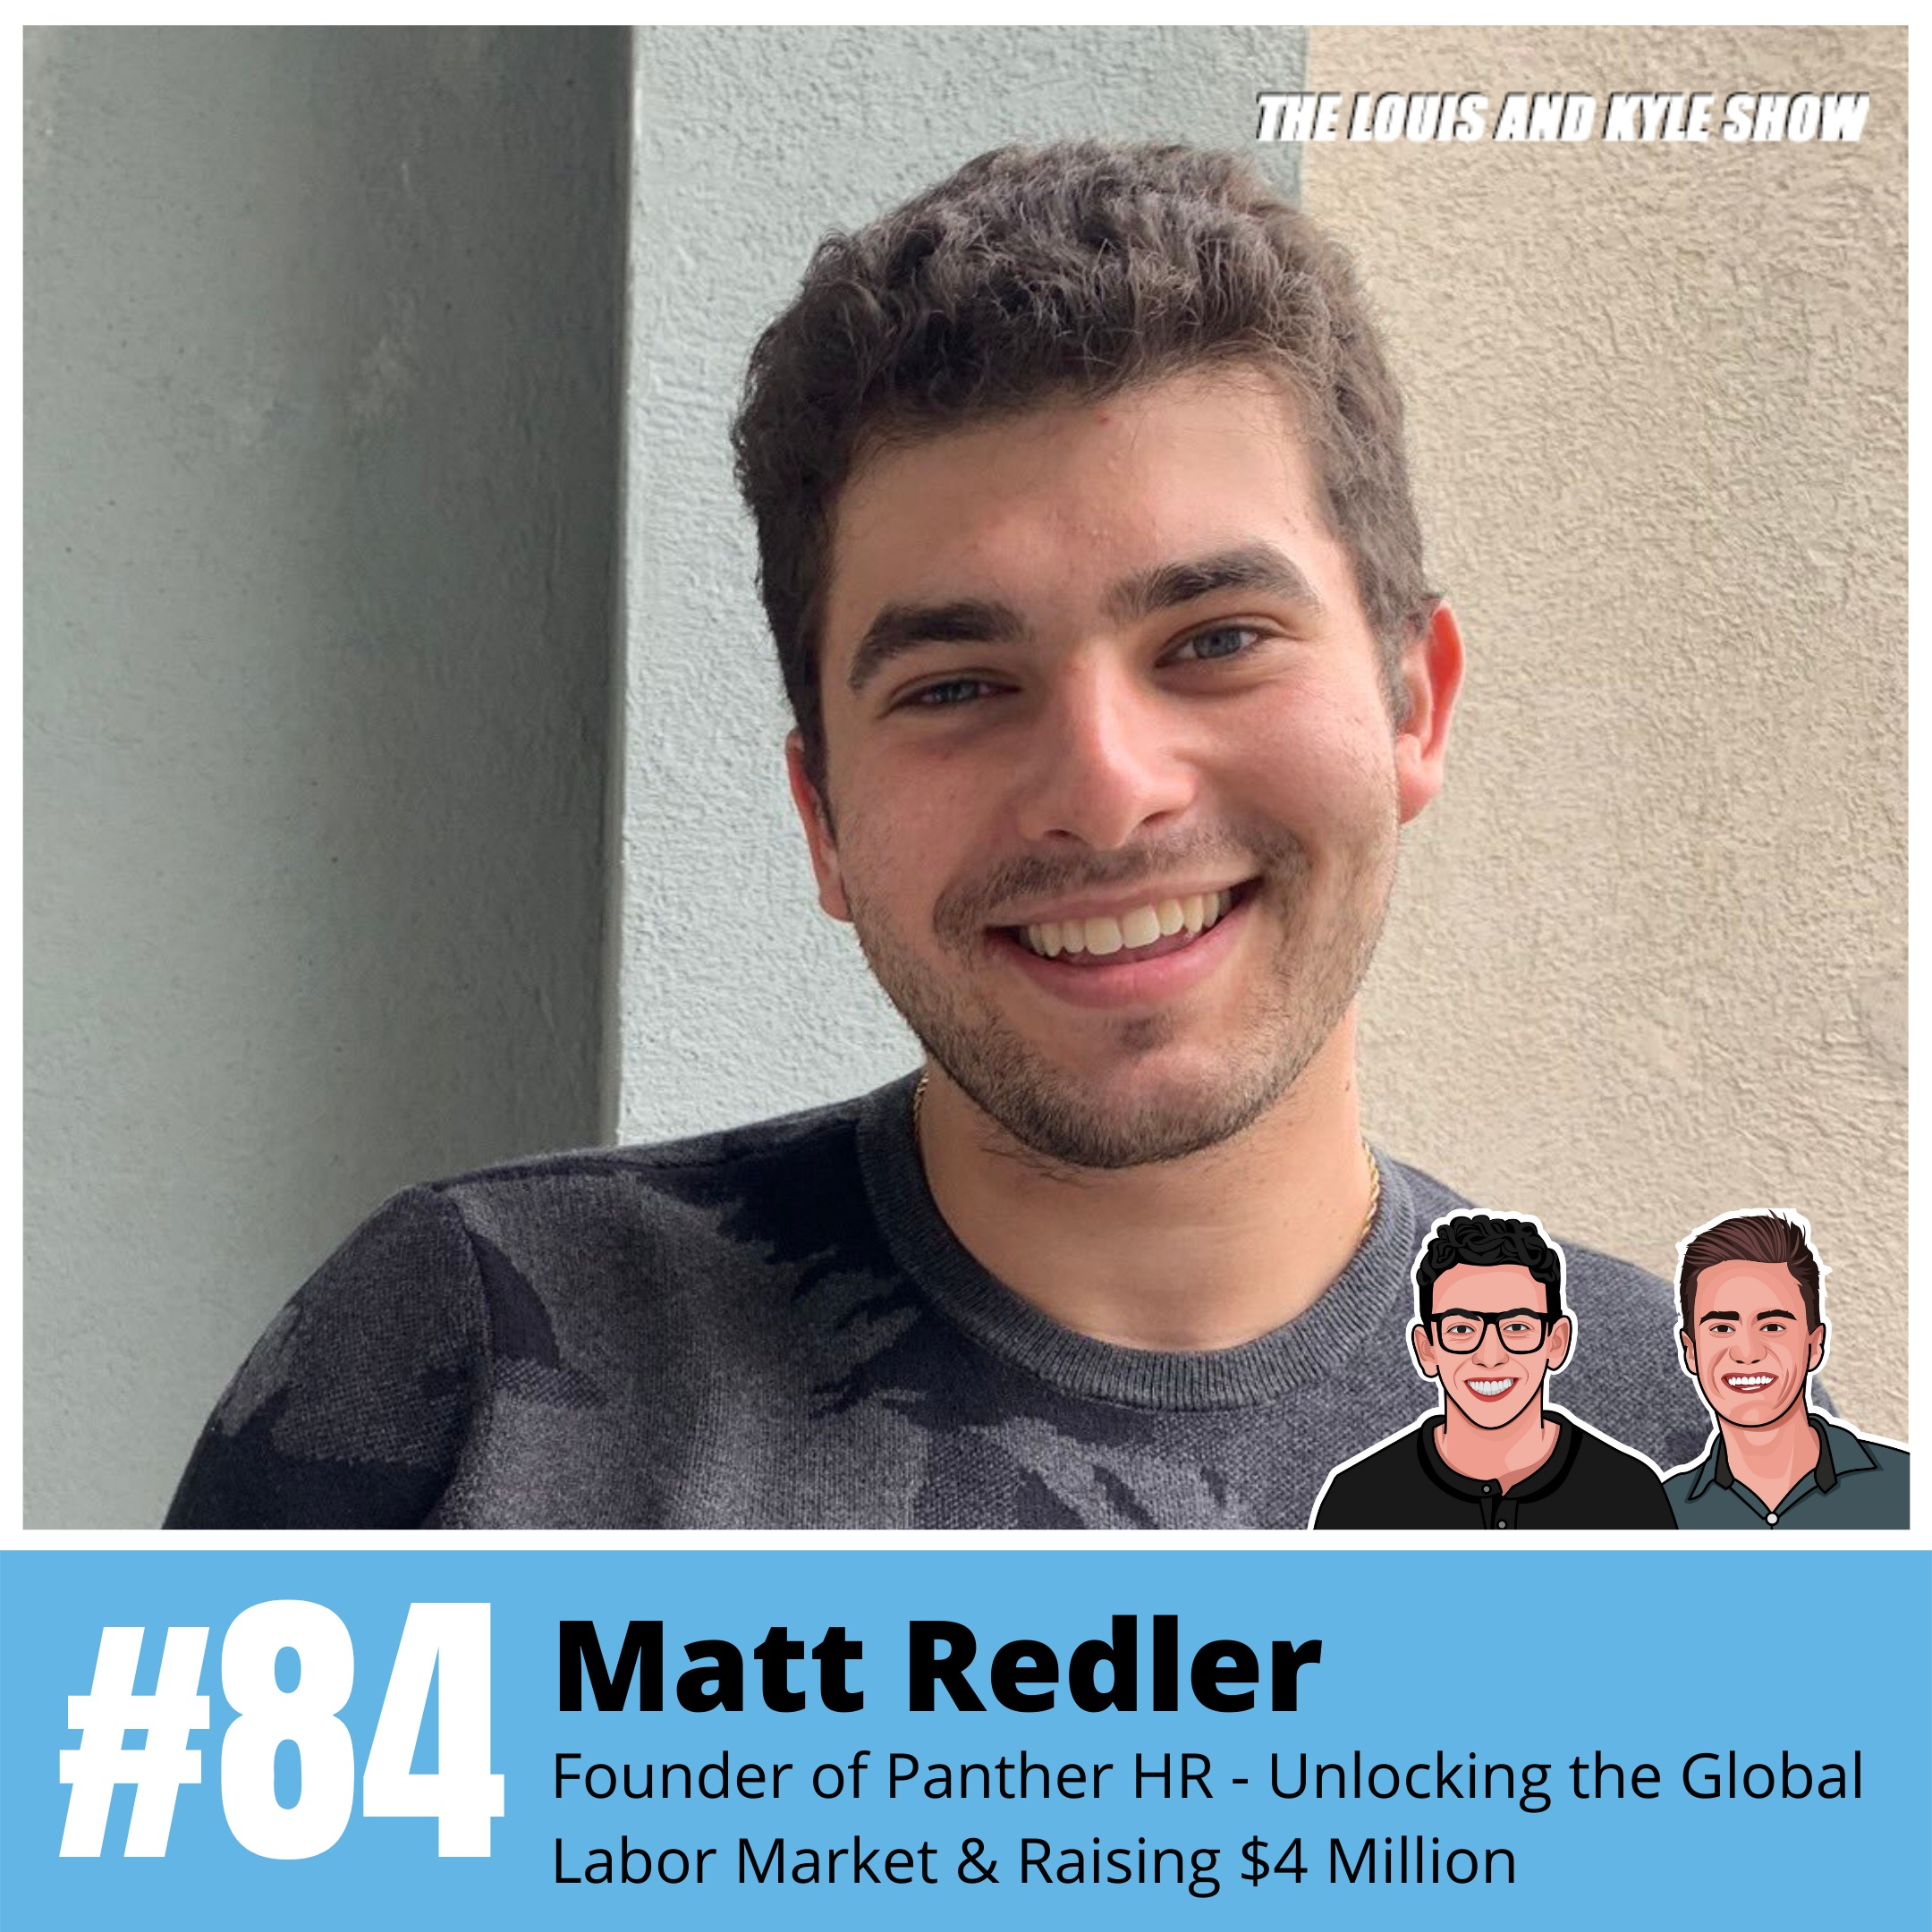 Matt Redler: Founder of Panther HR - Unlocking the Global Labor Market & Raising $4 Million from VCs